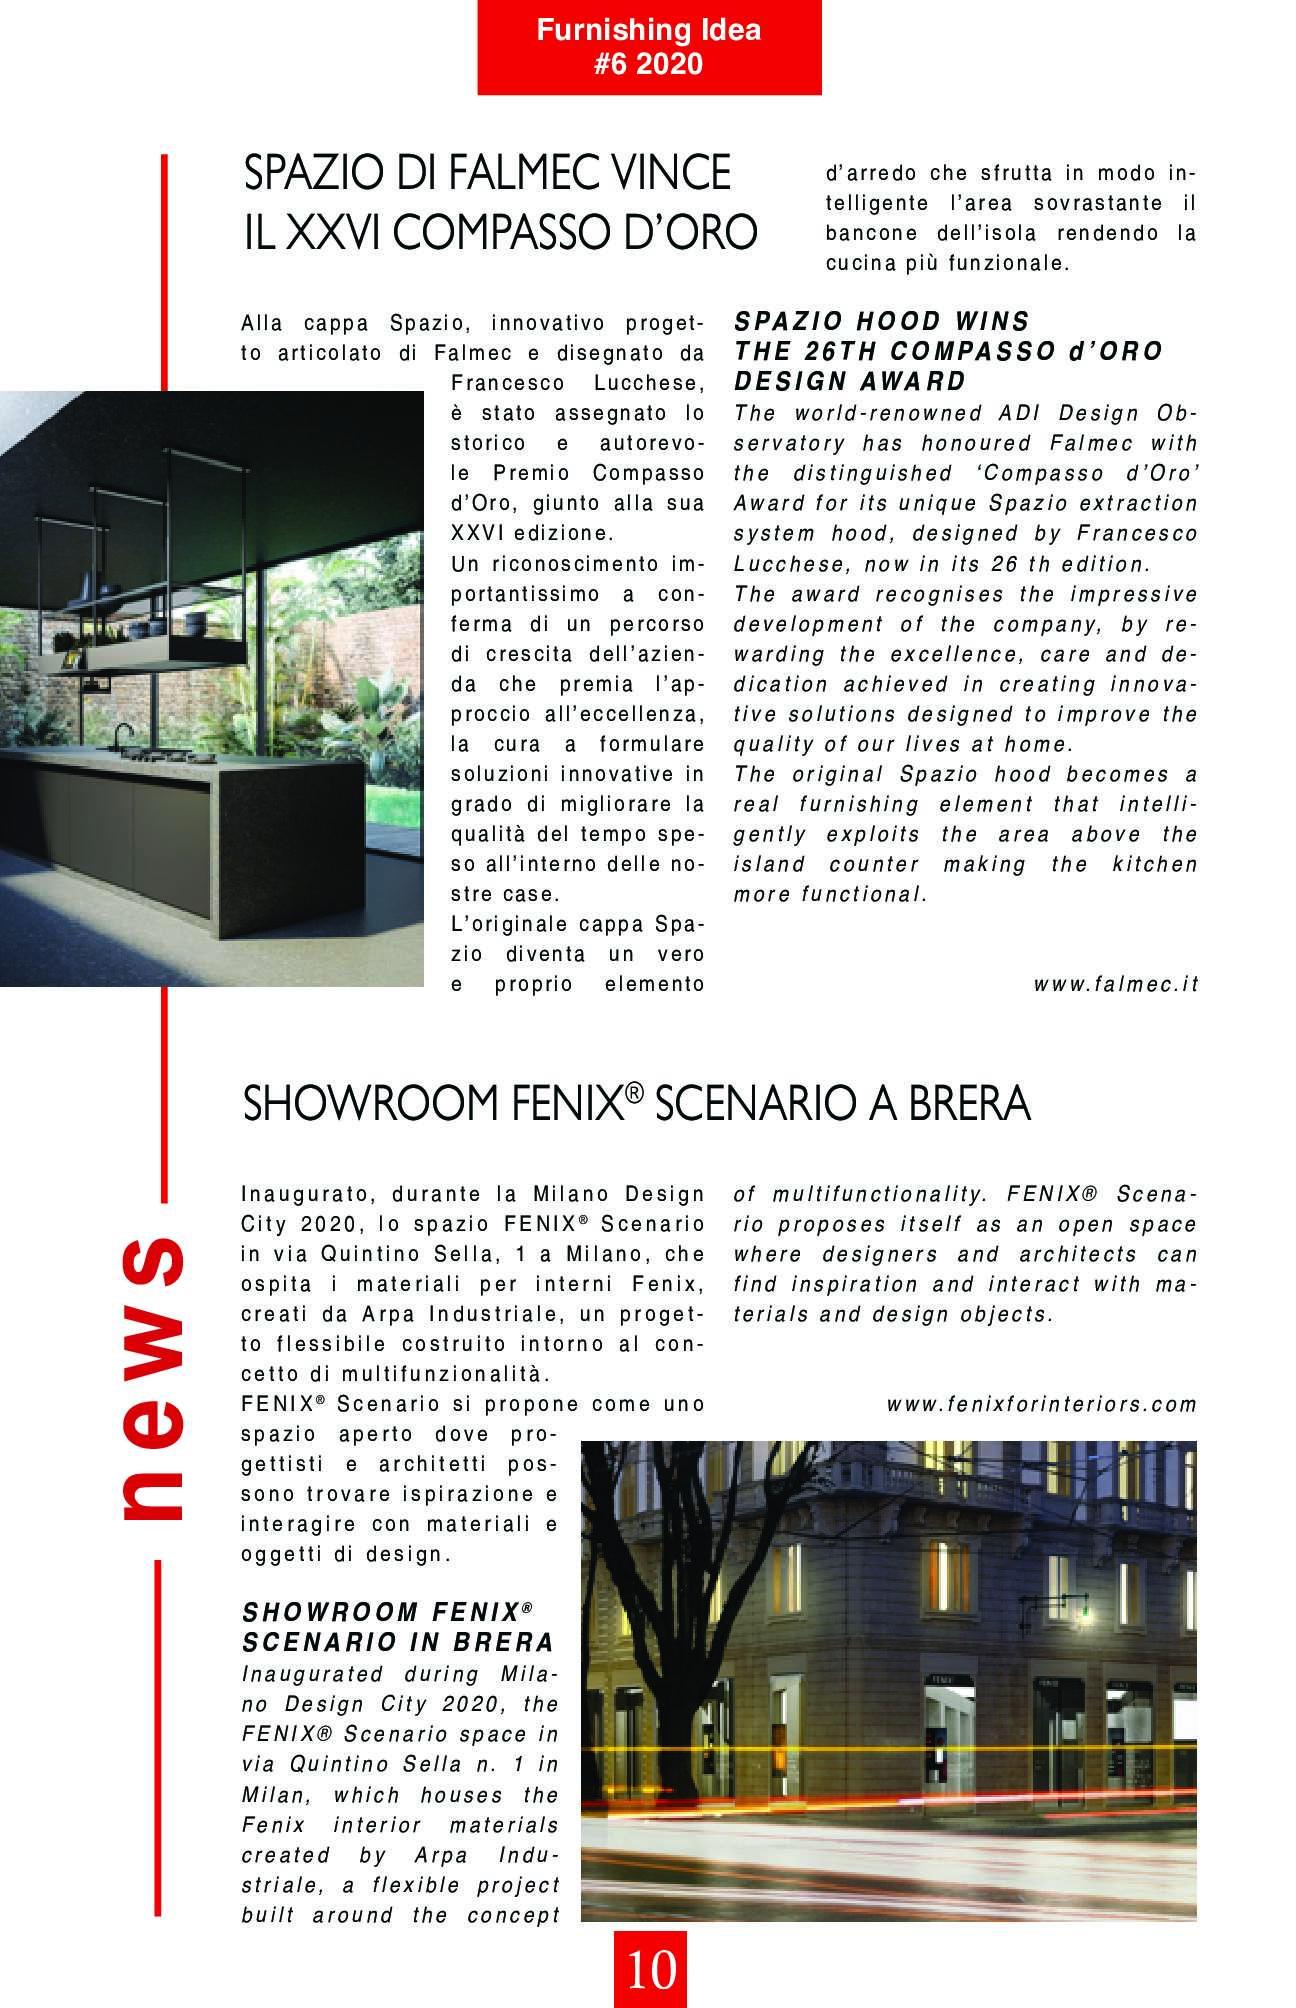 furnishingidea-6-2020_journal_22_009.jpg